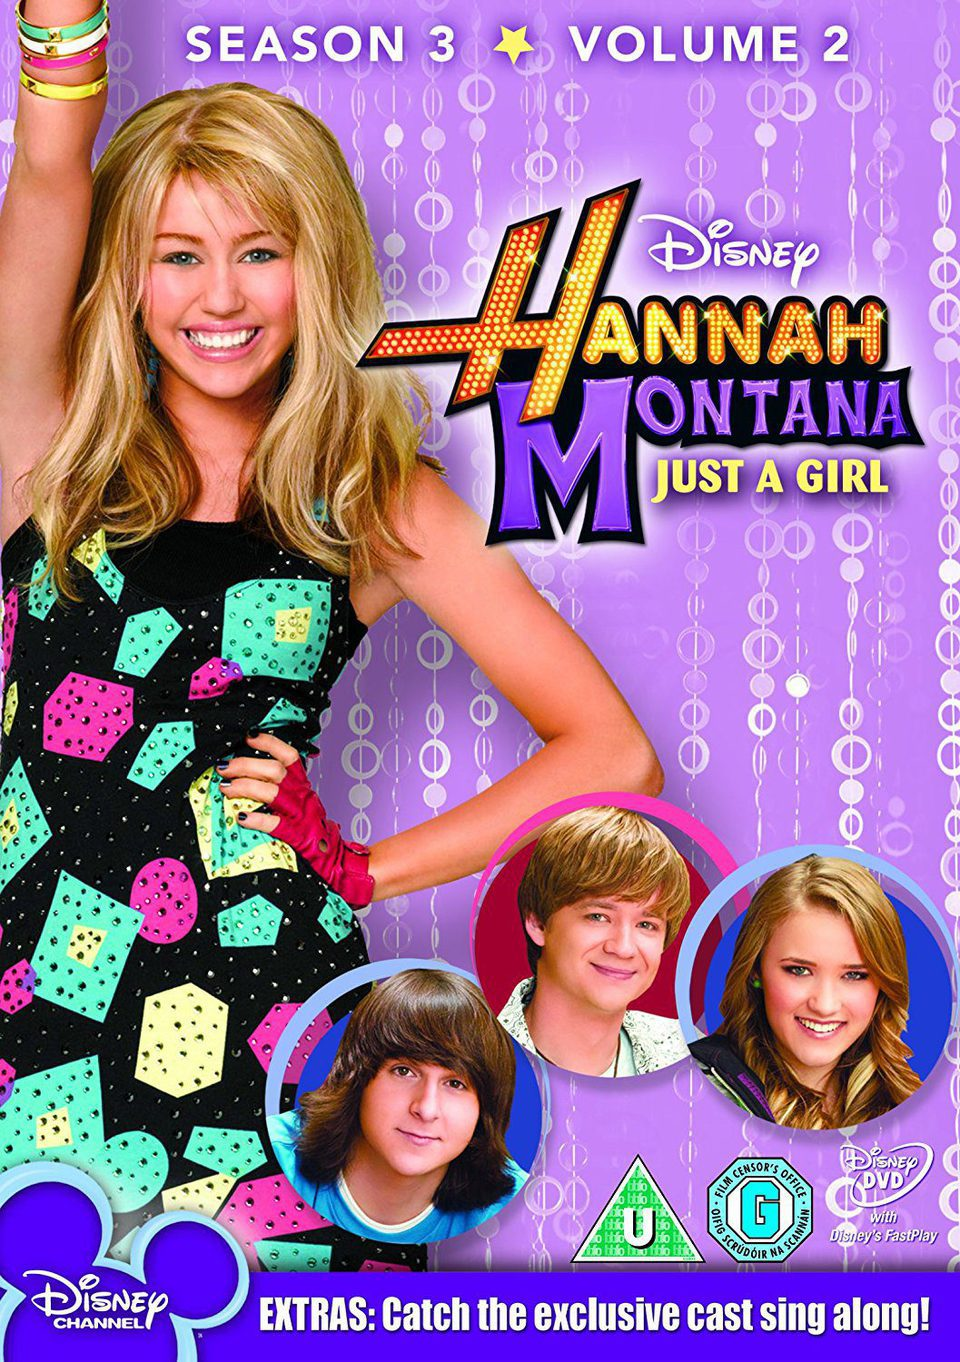 Cartel Temporada 3 de 'Hannah Montana'